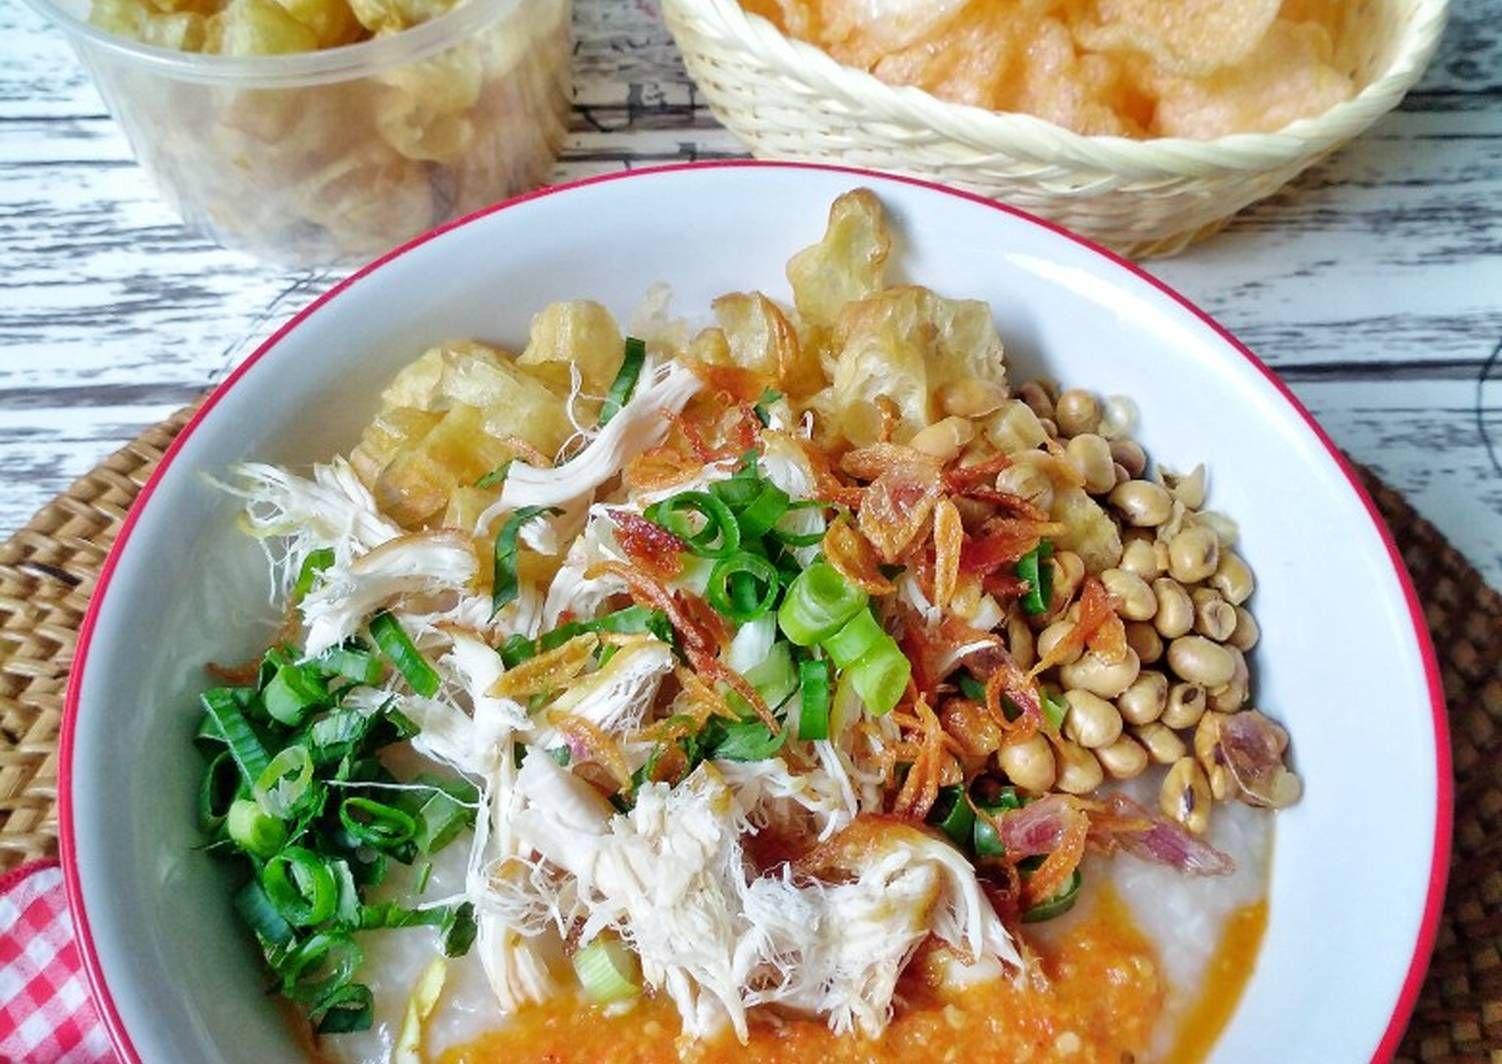 Resep Bubur Ayam Oleh Susan Mellyani Resep Di 2020 Memasak Makanan Resep